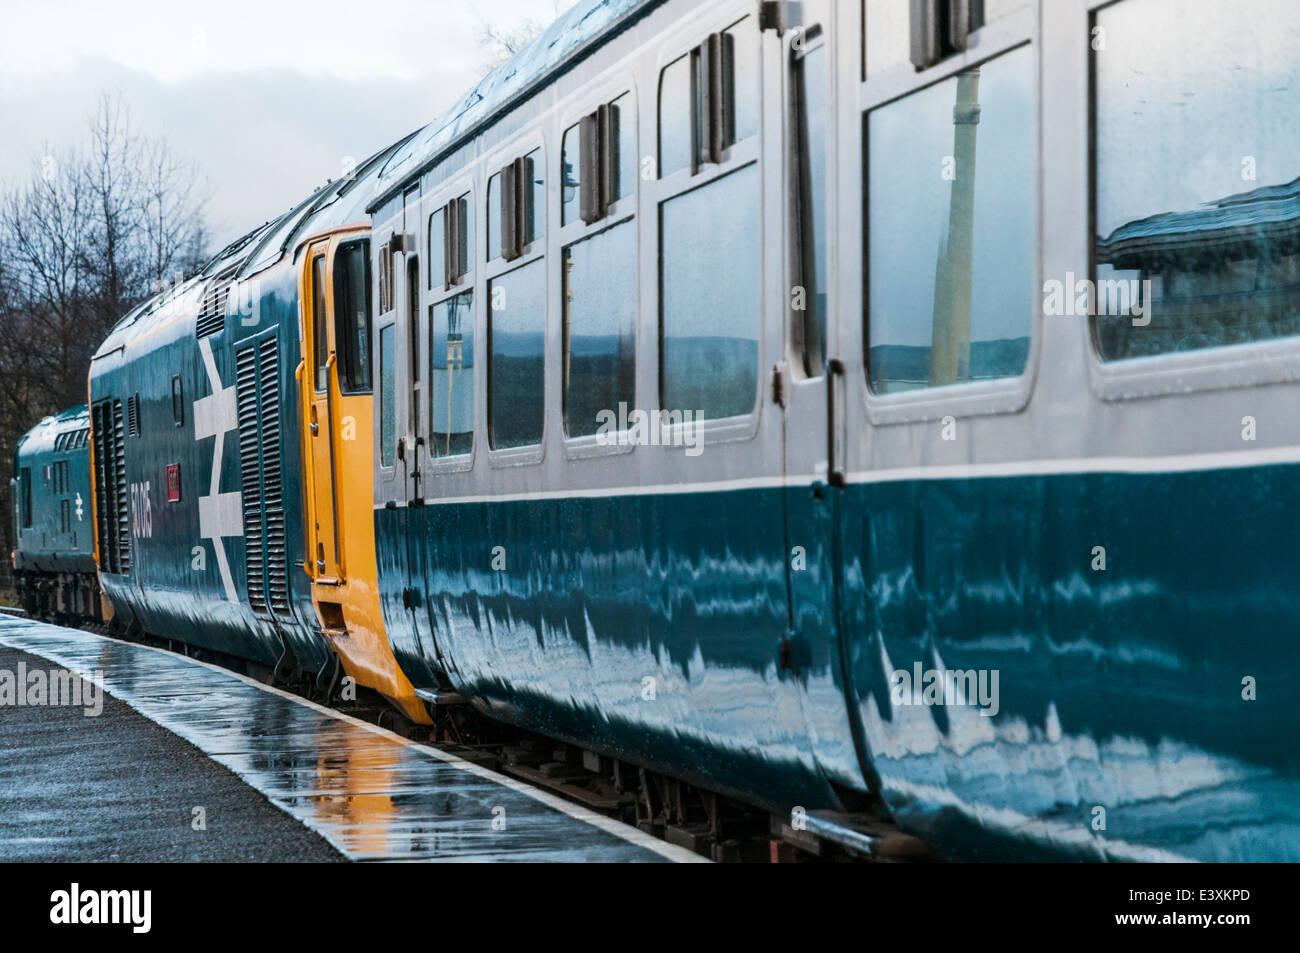 Class 50 loco 50015 Valiant waits to leave a rainy Rawtenstall station on the East Lancs Railway Stock Photo